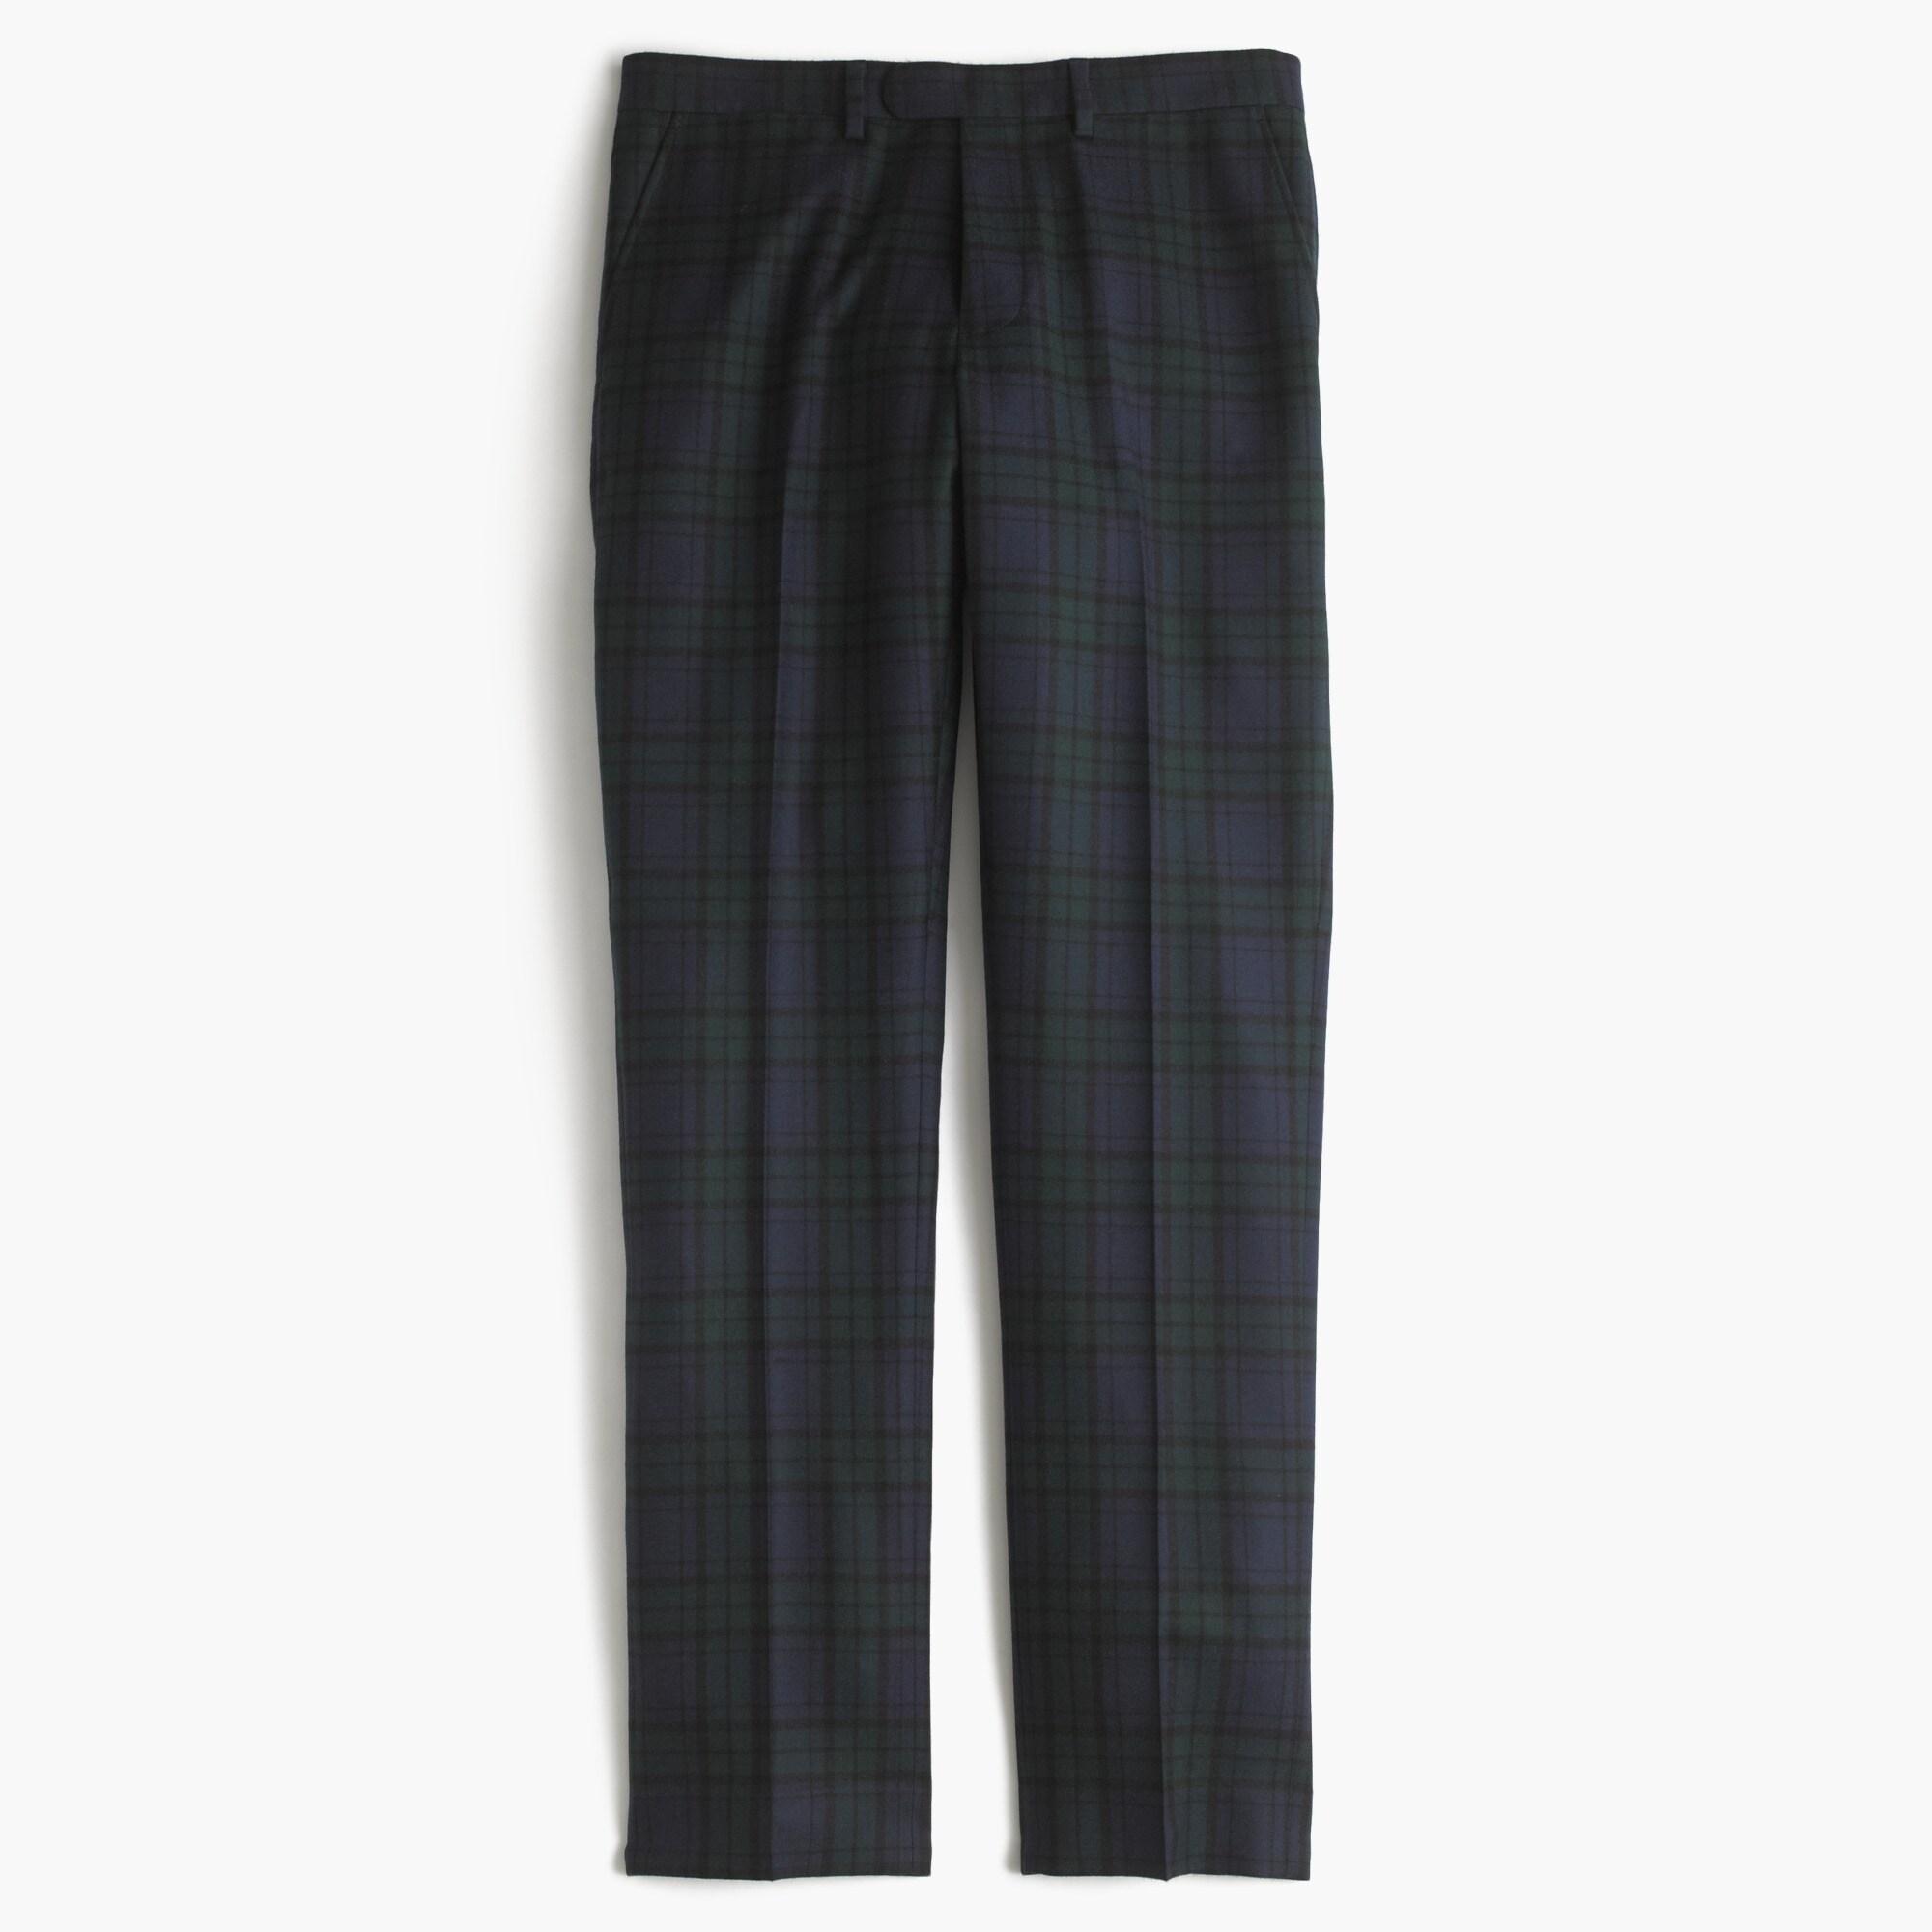 Bowery slim pant in green plaid English wool